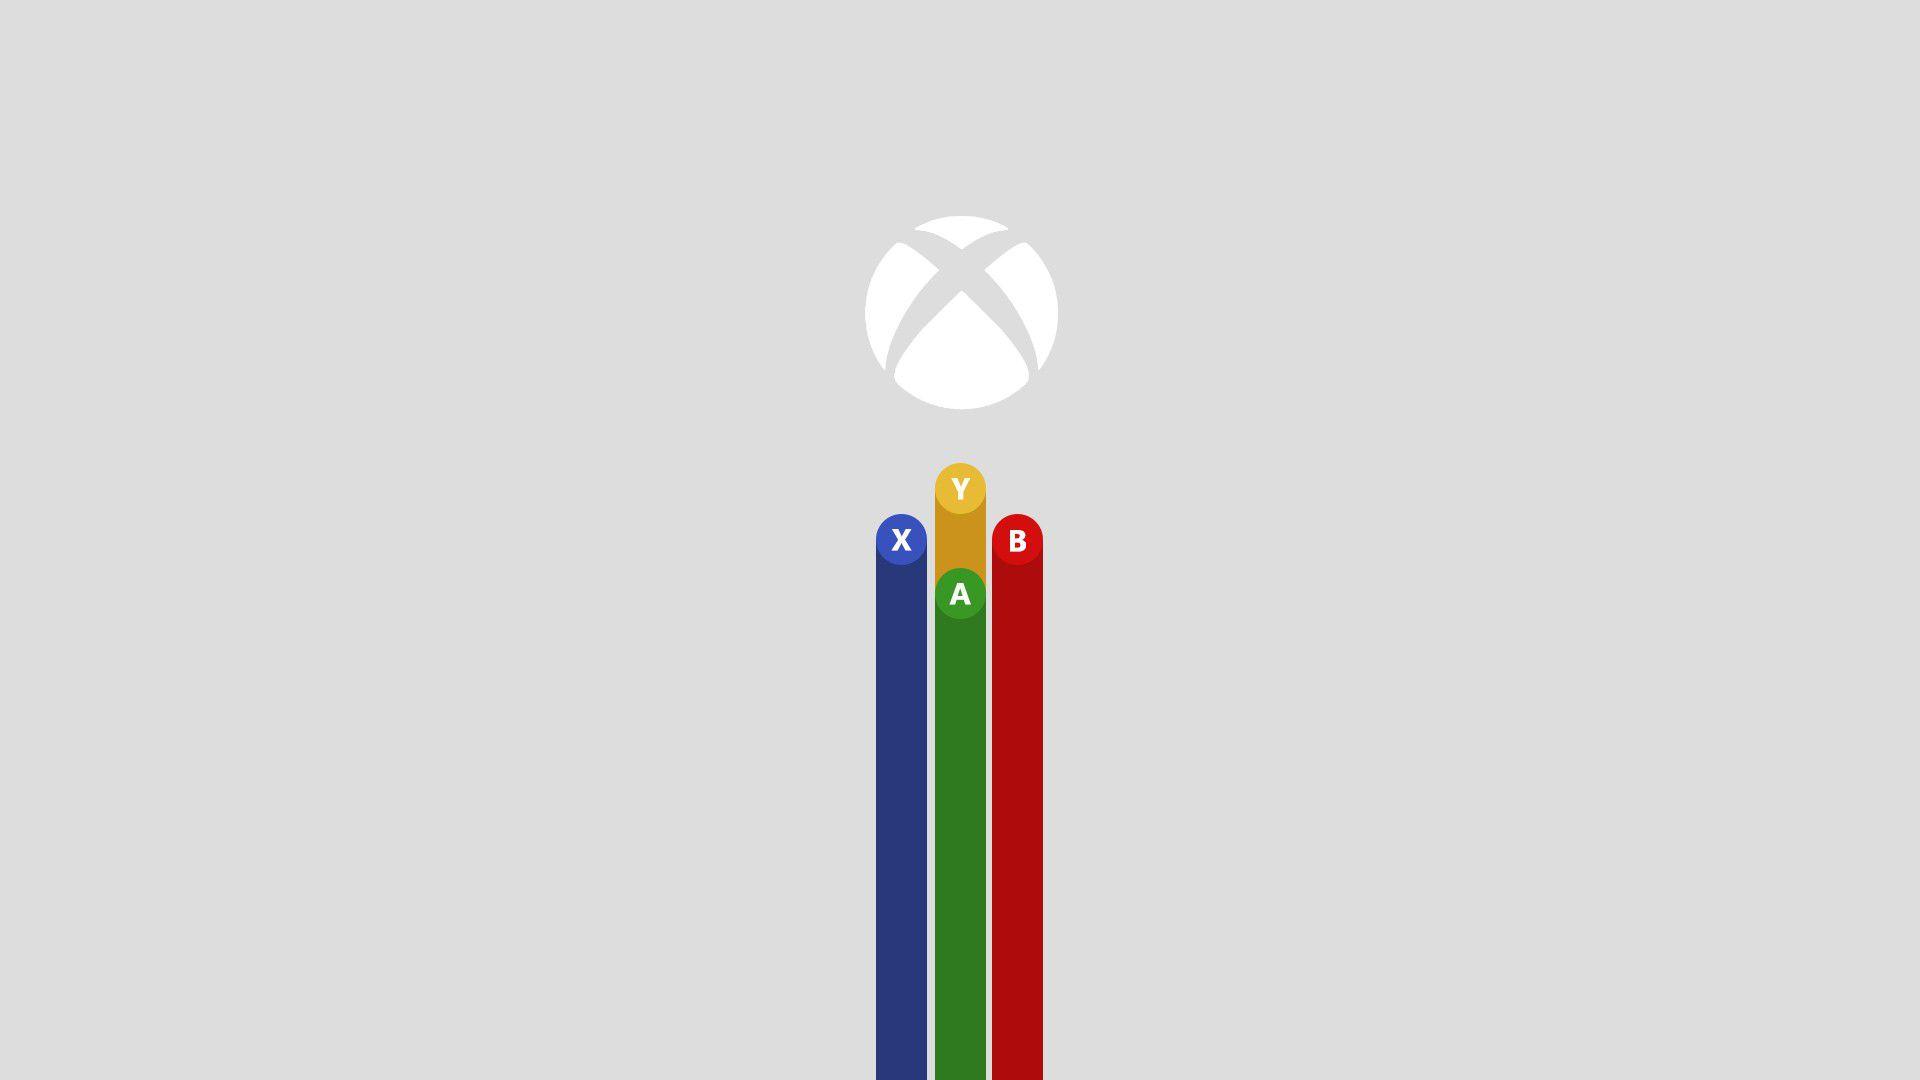 Minimal Wallpaper Iphone Xbox Wallpaper 05 1920x1080